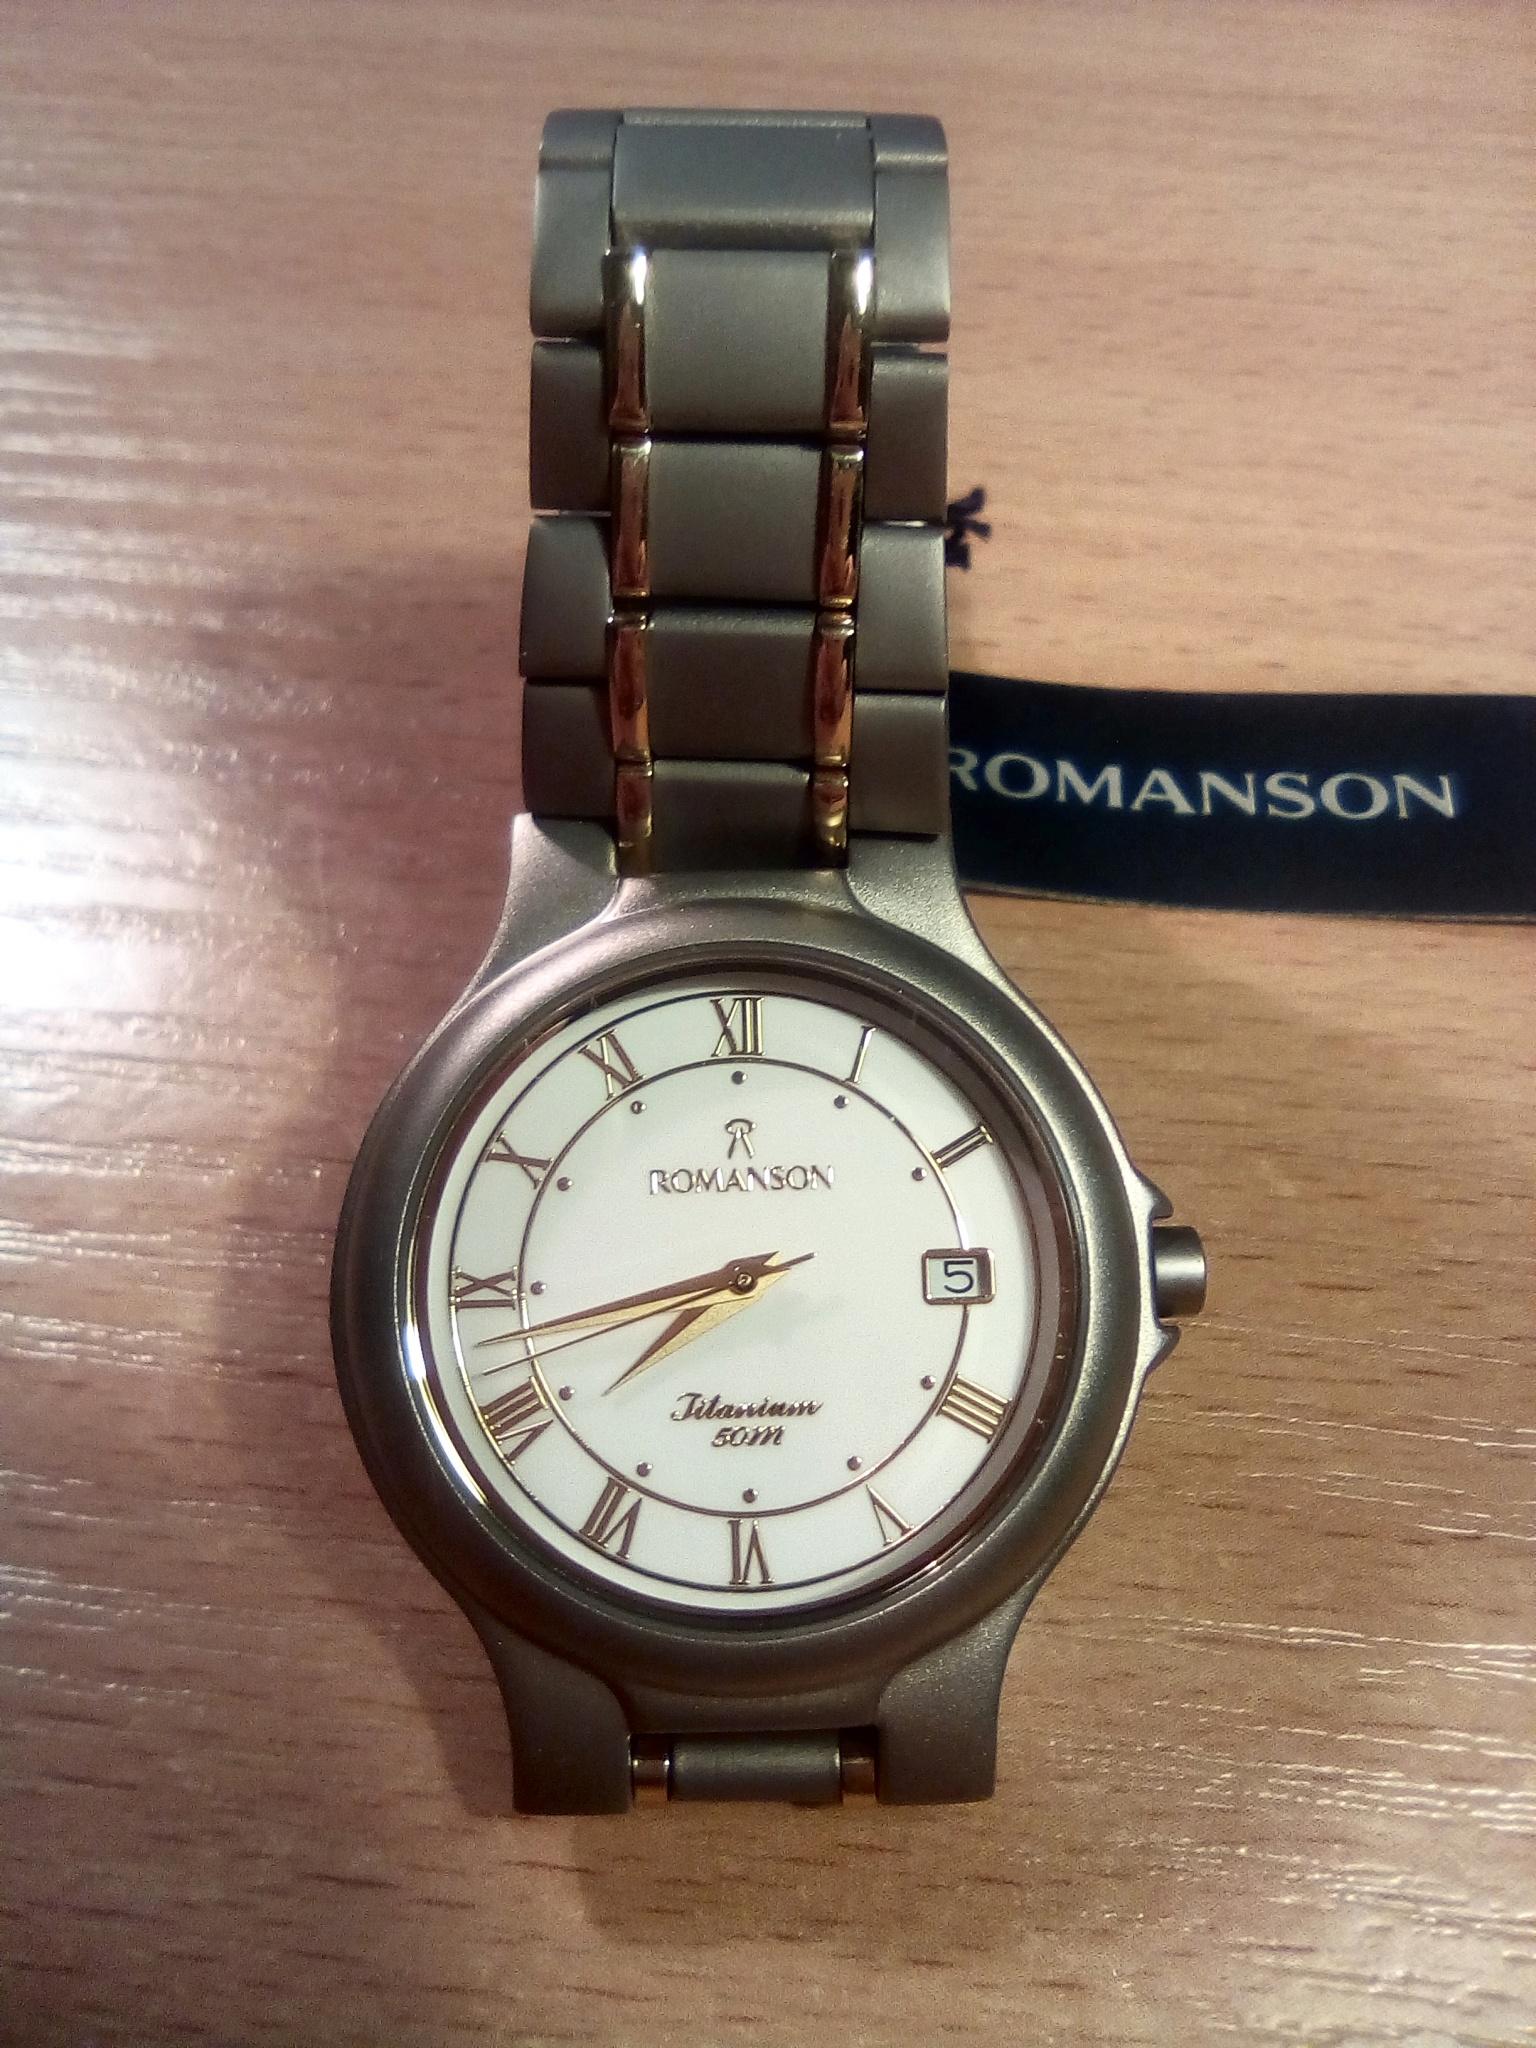 bce2a33f71ff Обзор от покупателя на Наручные часы Romanson TM 8697 MC(WH ...